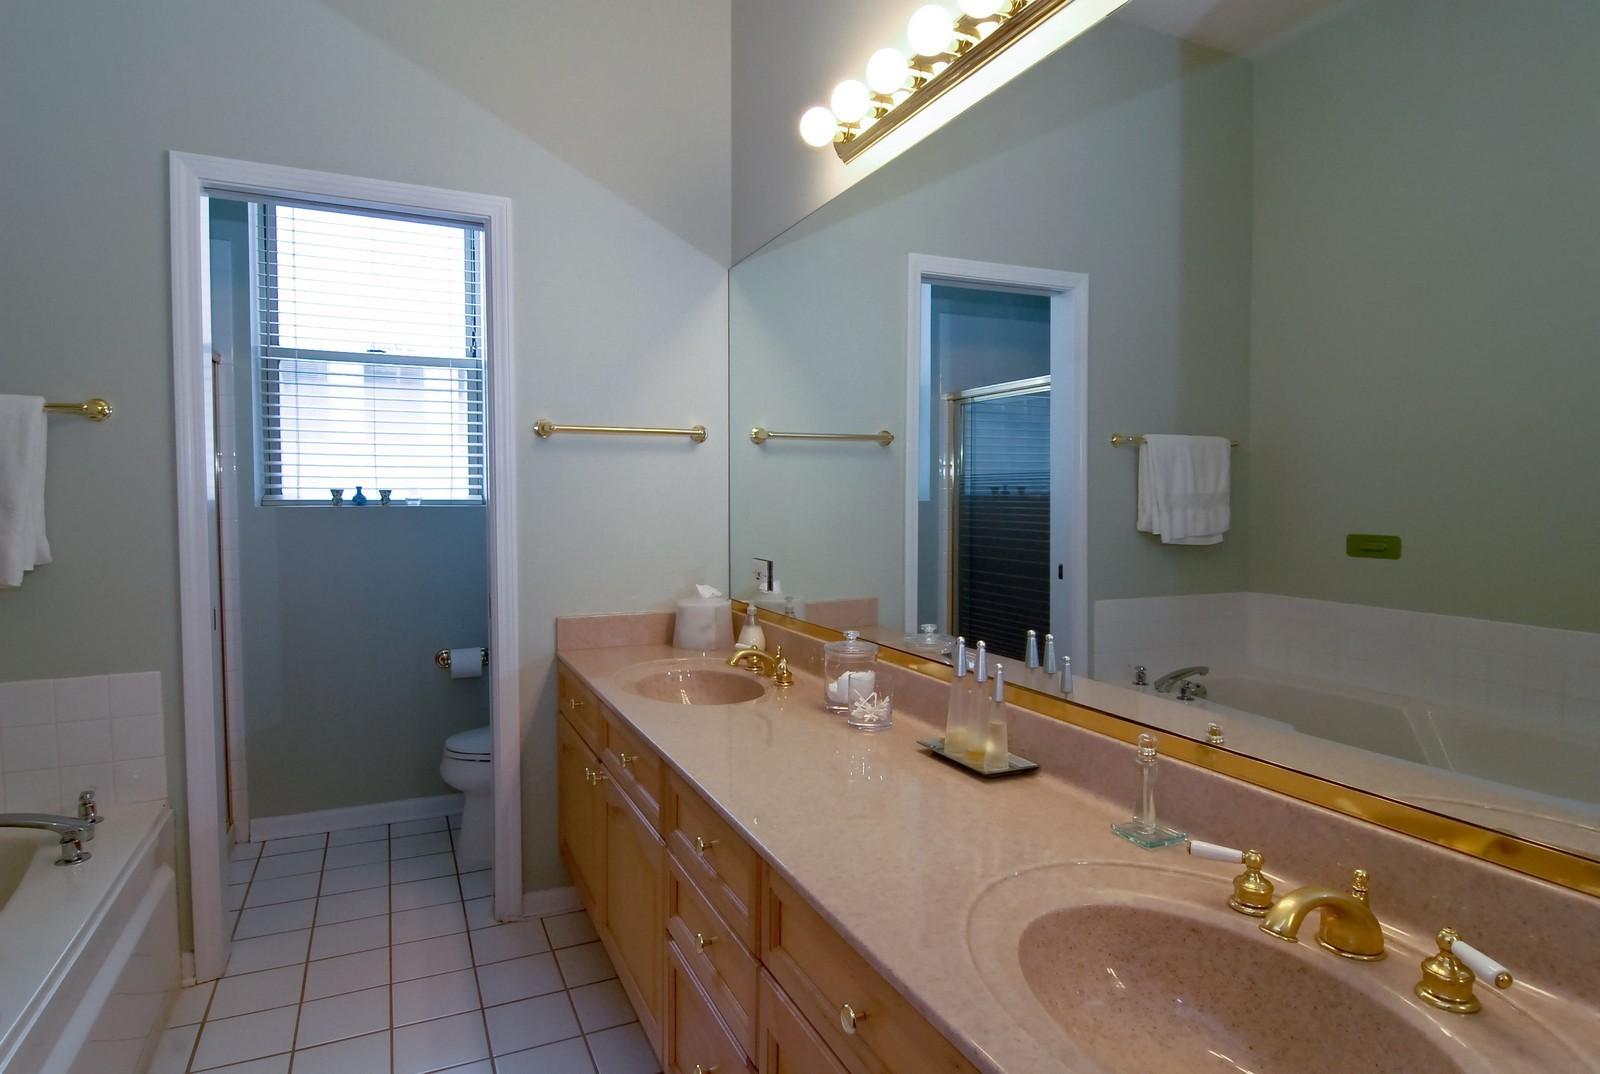 Real Estate Photography - 1350 W Fullerton, Unit 411, Chicago, IL, 60614 - Master Bathroom